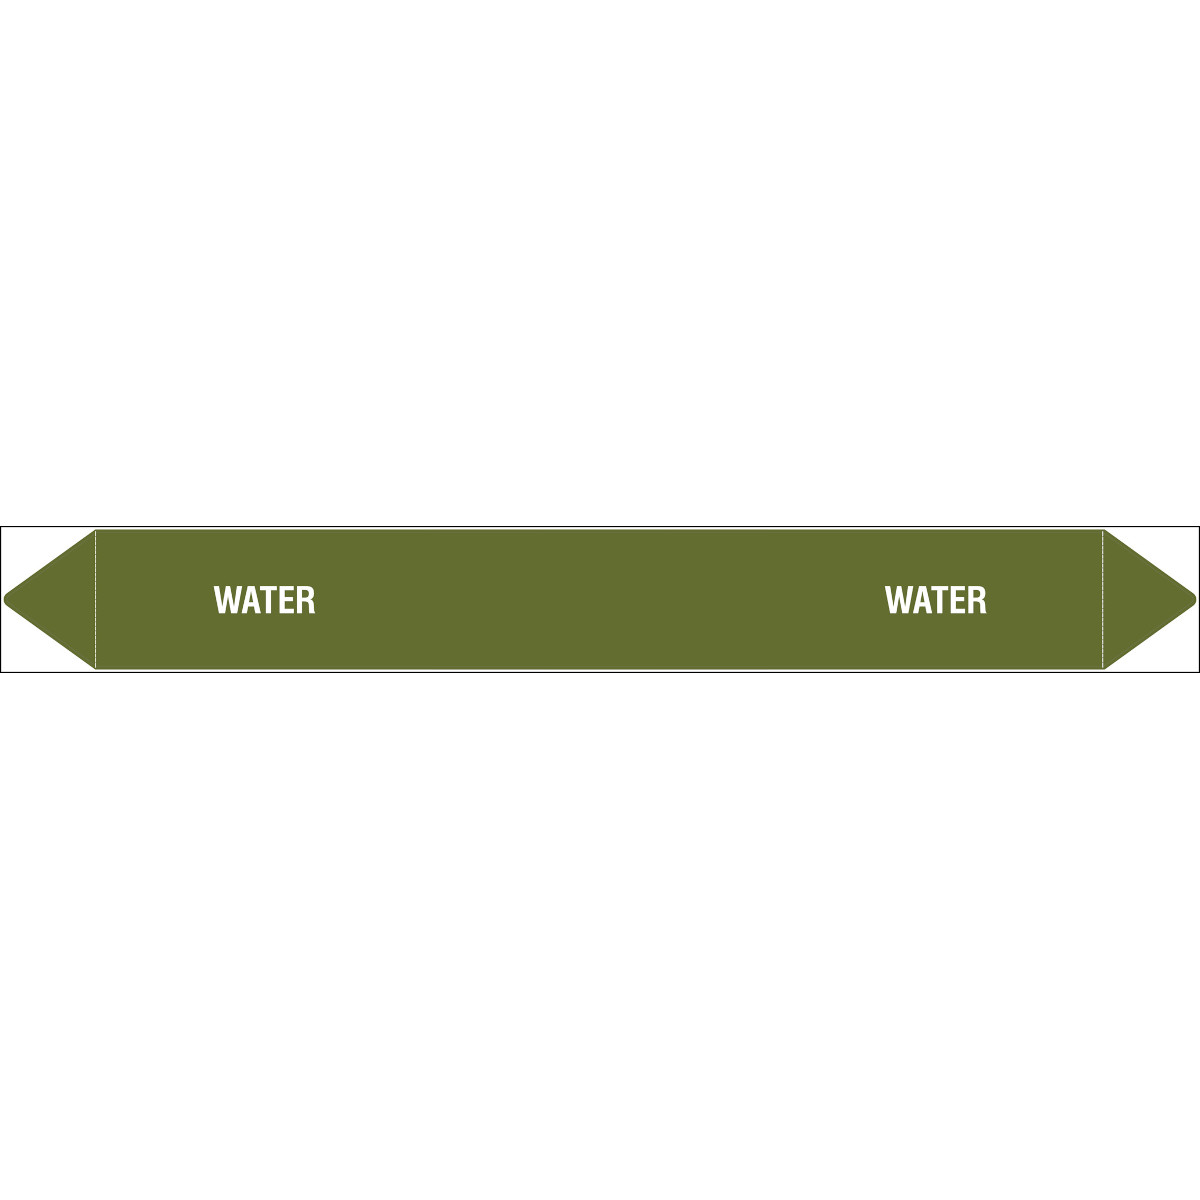 Water - Individual Peel Off Markers